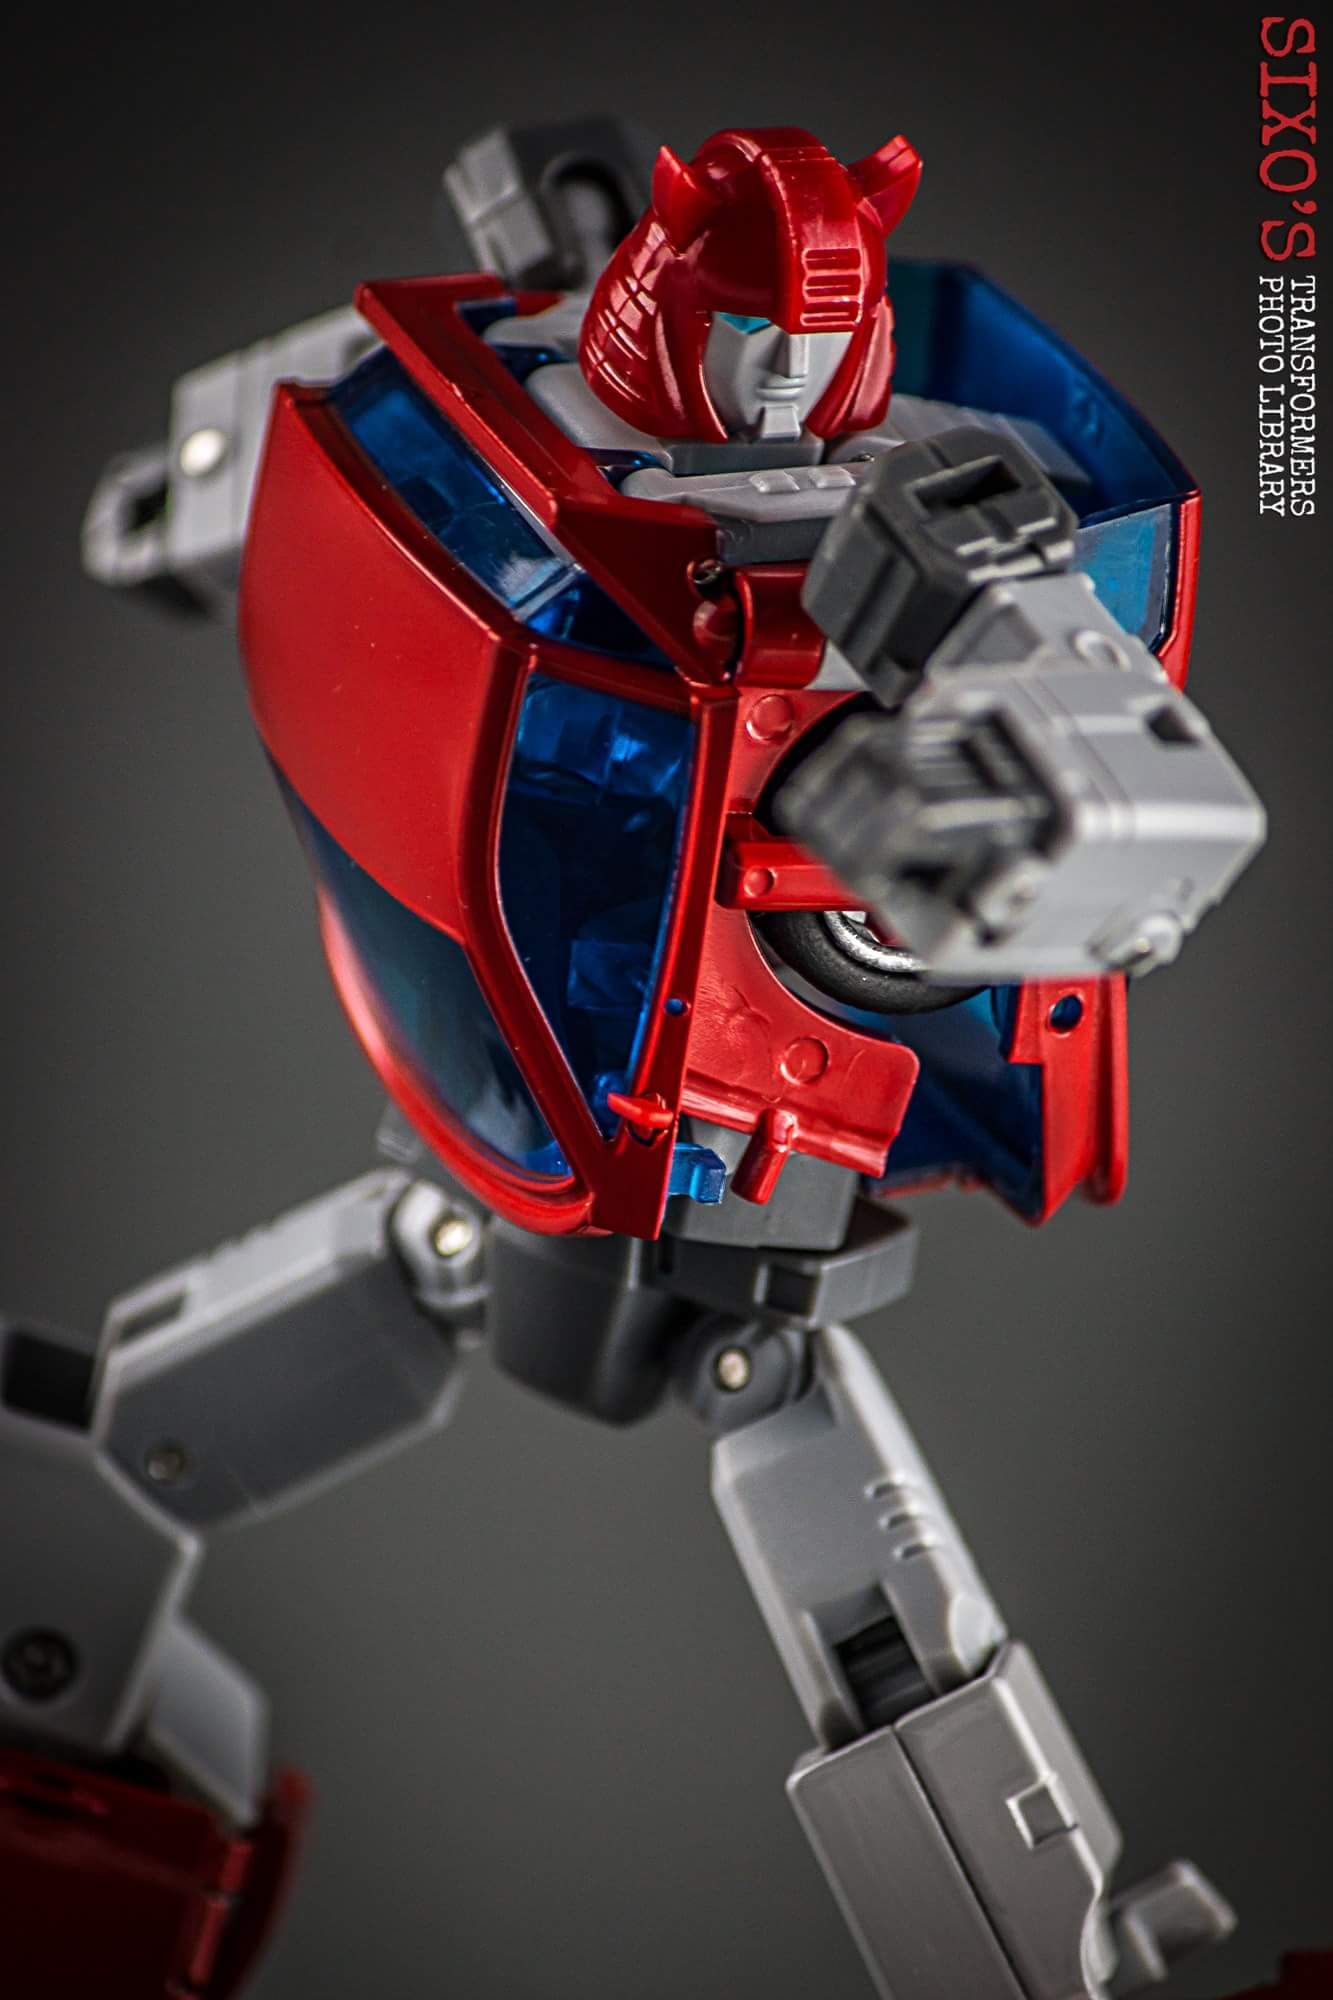 [ACE Collectables] Produit Tiers - Minibots MP - ACE-01 Tumbler (aka Cliffjumper/Matamore), ACE-02 Hiccups (aka Hubcap/Virevolto), ACE-03 Trident (aka Seaspray/Embruns) TSAIHfuE